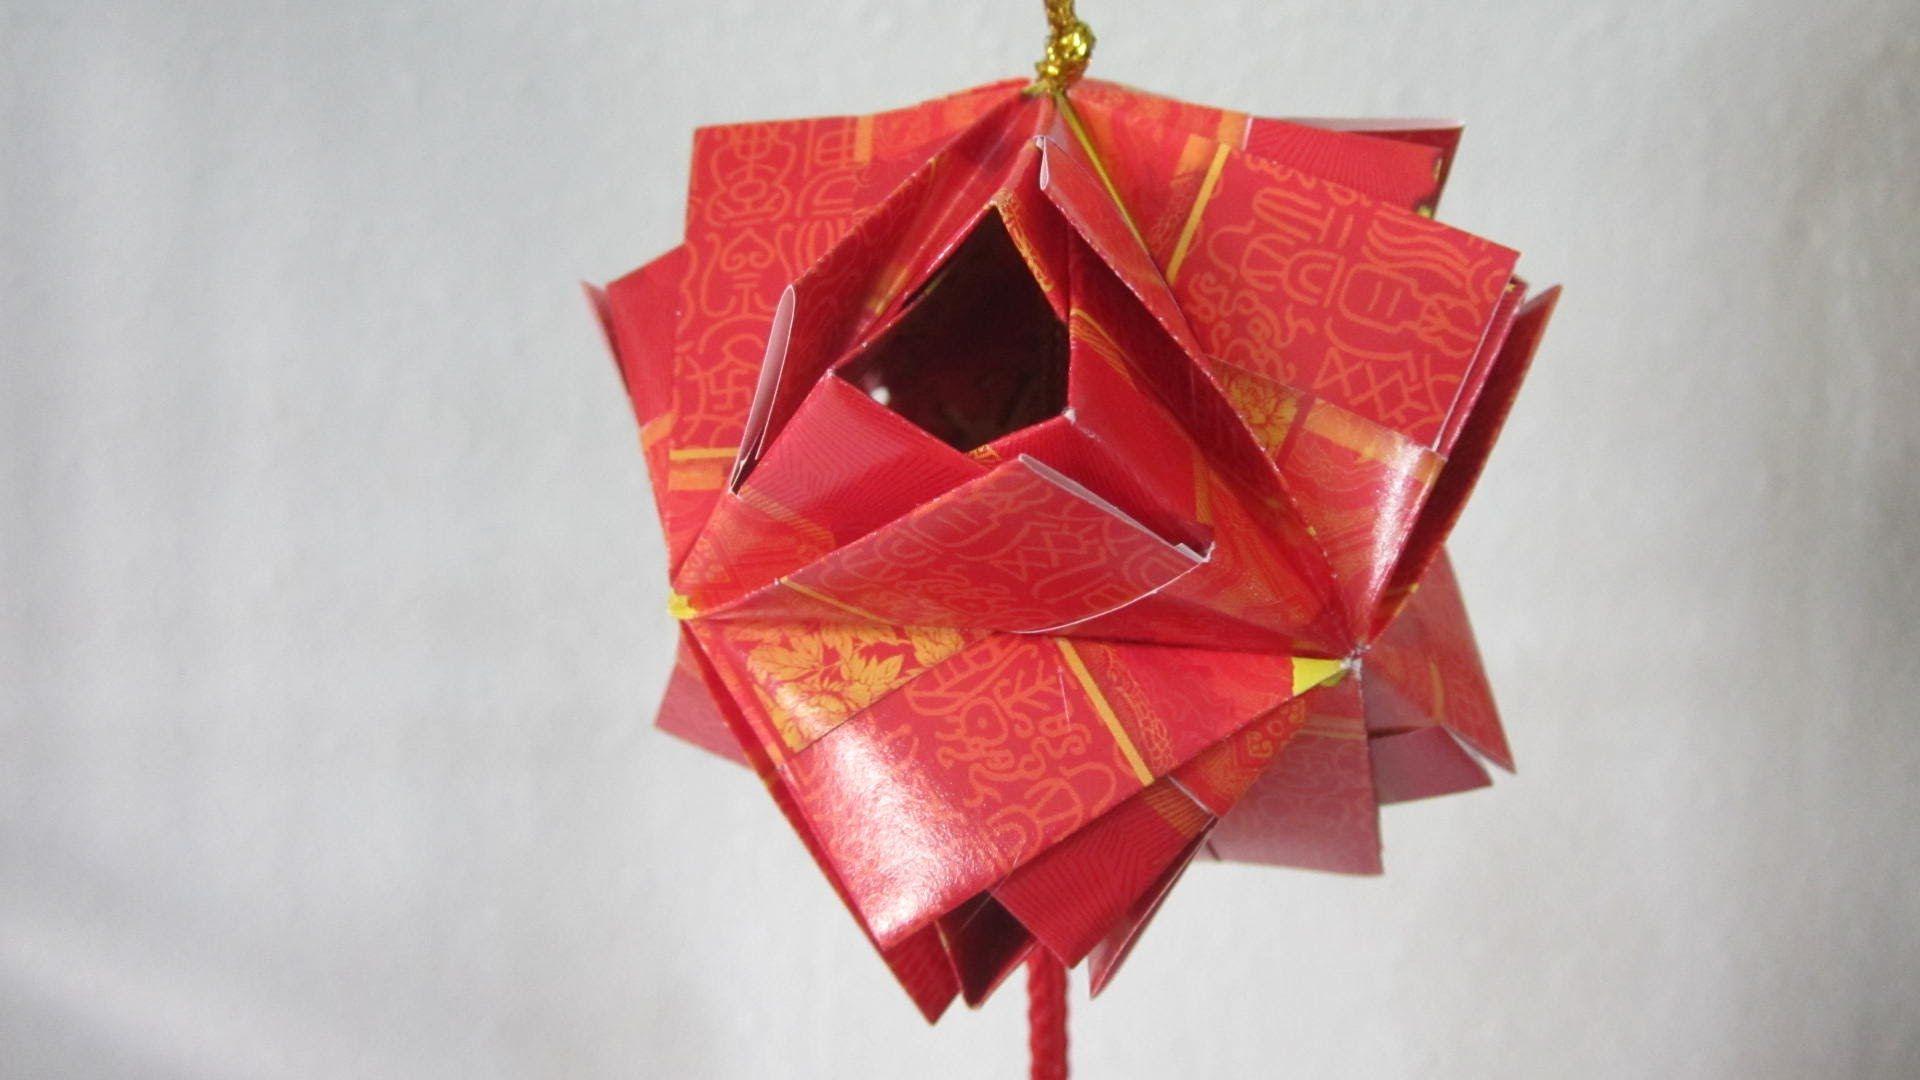 Cny Tutorial No 25 12 Unit Etna Kusudama Creator Ms Maria Sinayskaya Chinese New Year Decorations New Years Decorations Ang Pow